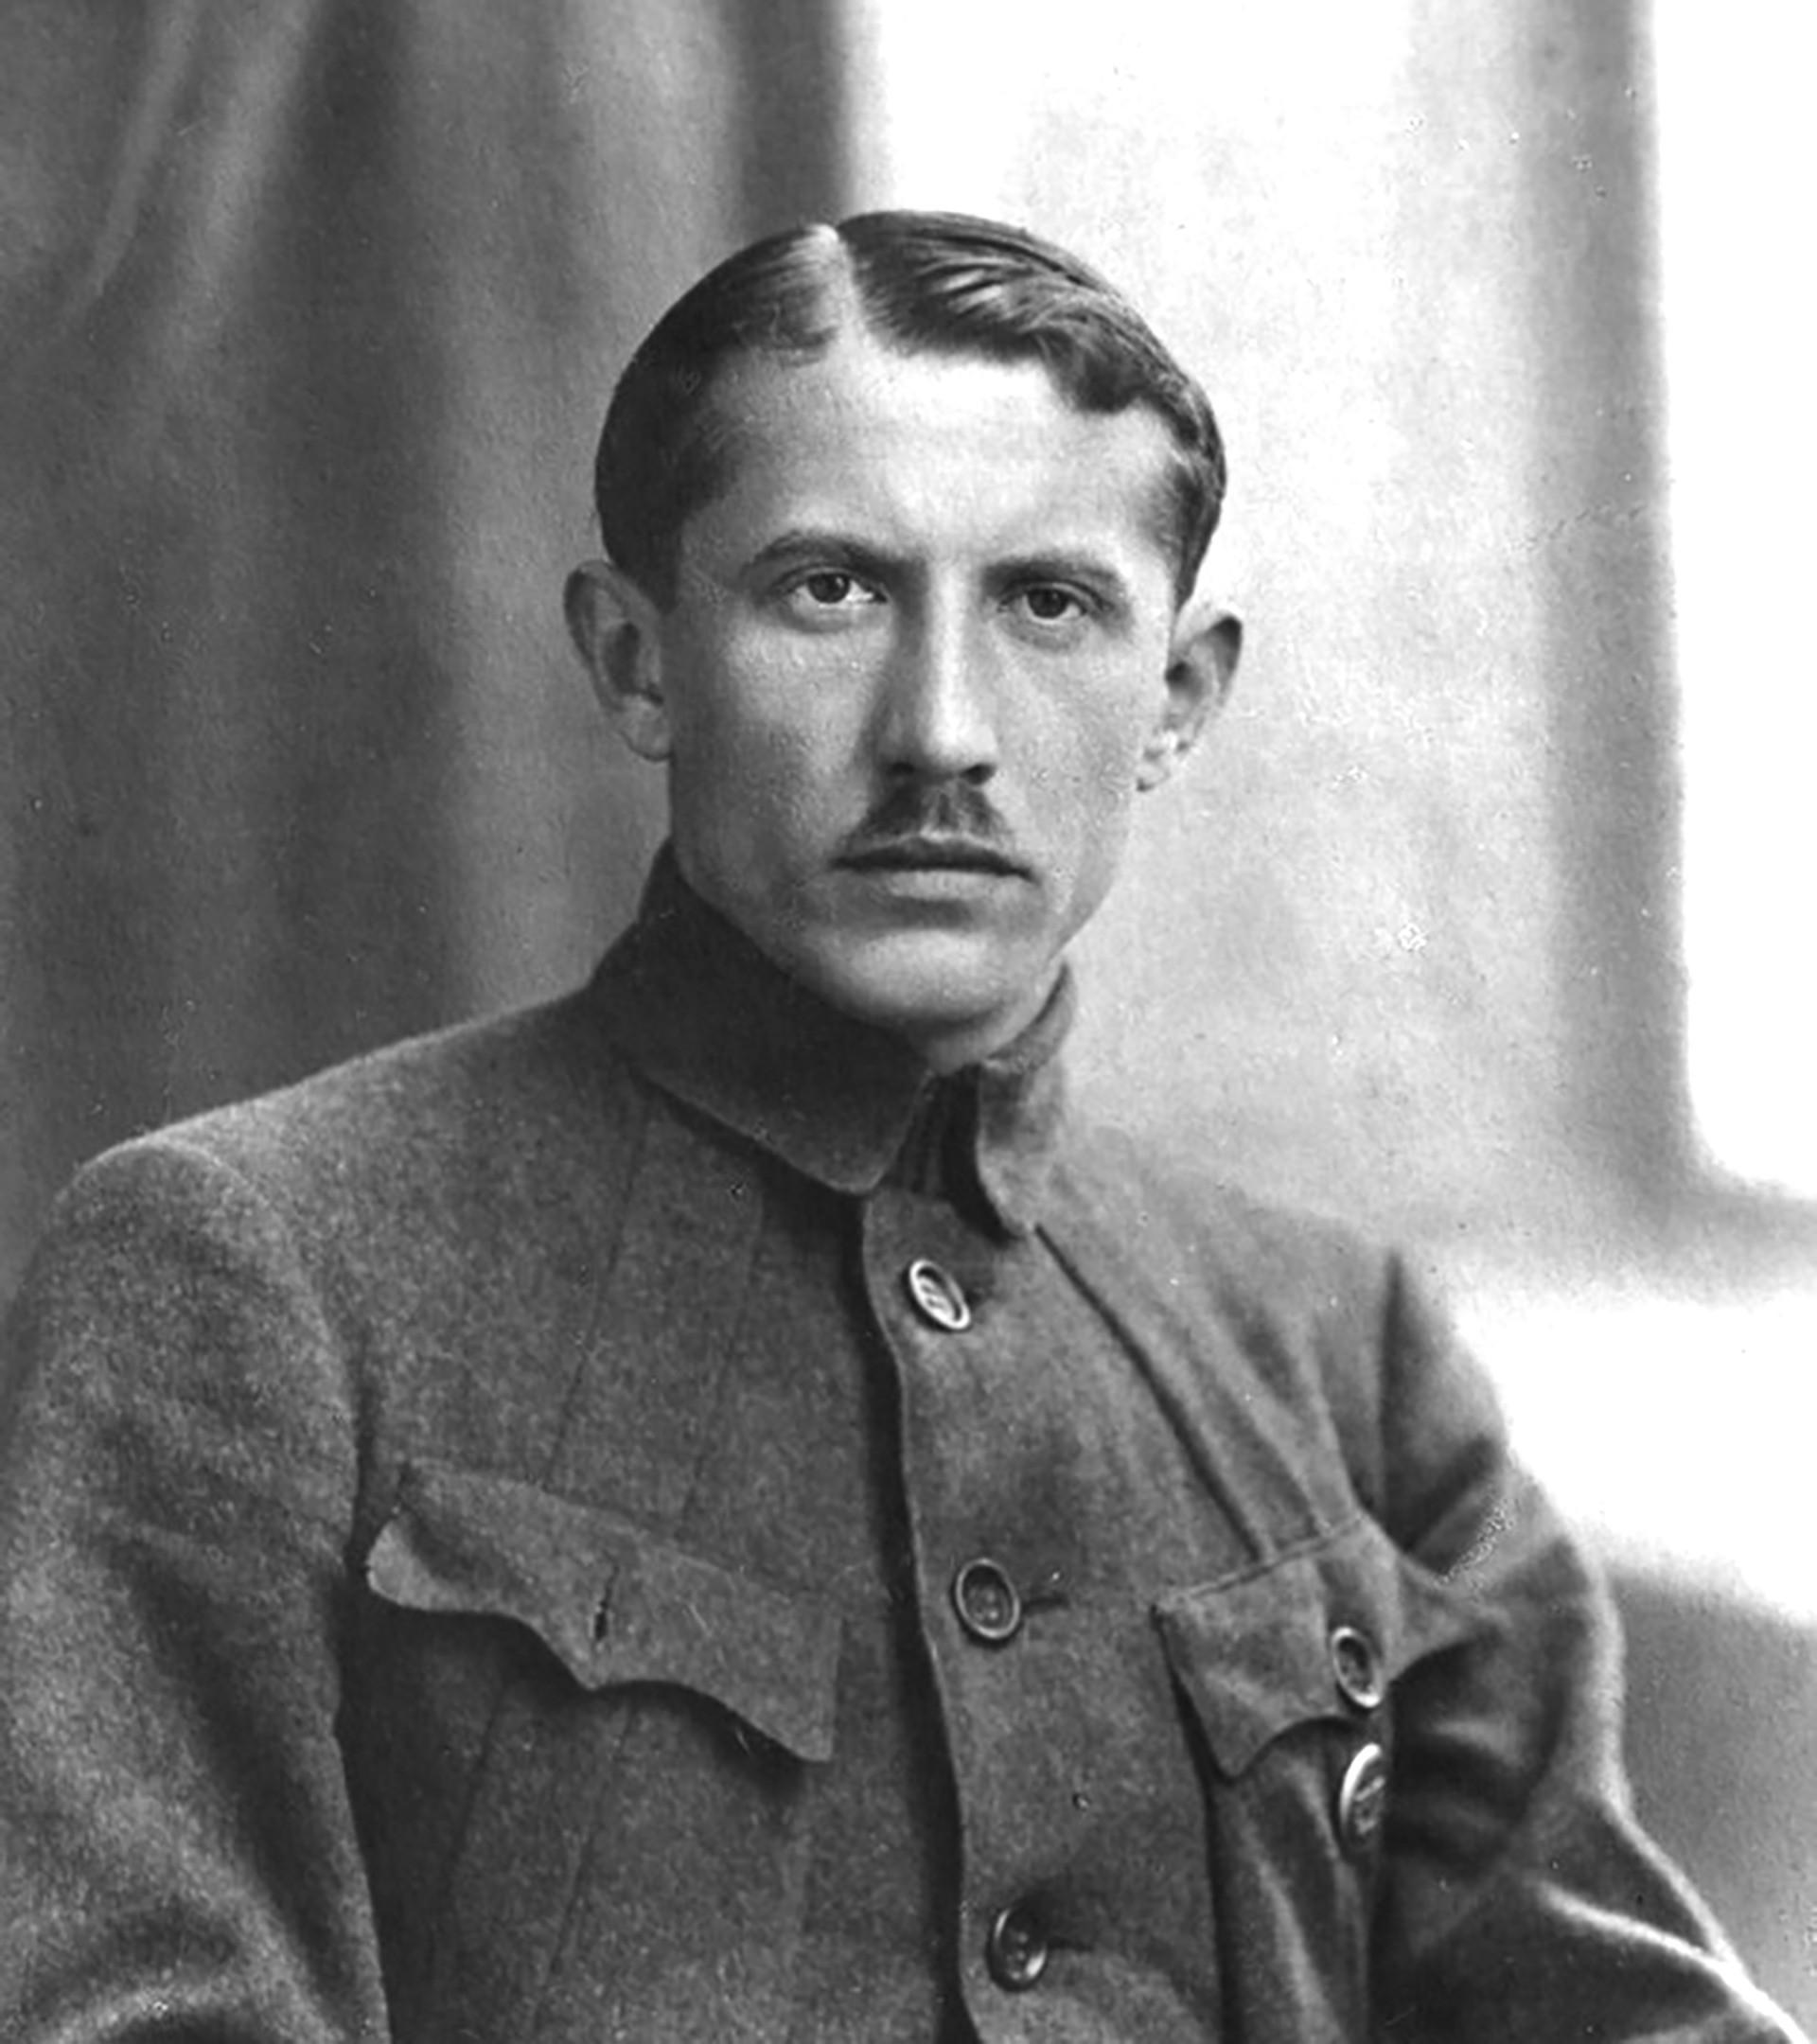 Yevhen Konovalets, a Ukrainian nationalist whom Sudoplatov assassinated.